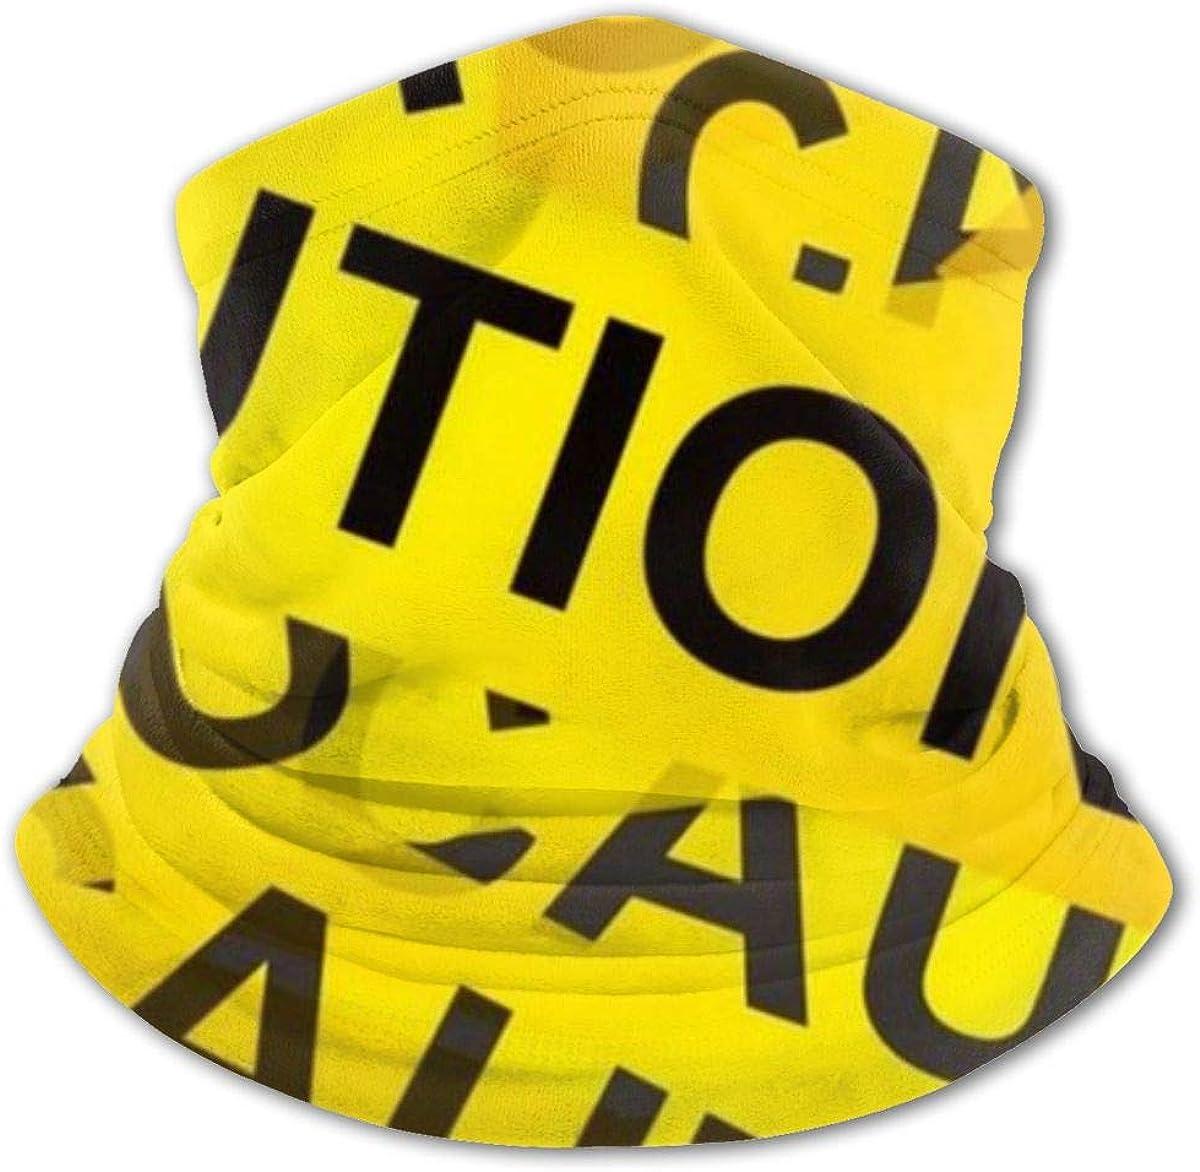 Caution Tape Headwear For Girls And Boys, Head Wrap, Neck Gaiter, Headband, Tenn Fishing Mask, Magic Scarf, Tube Mask, Face Bandana Mask For Camping Running Cycling